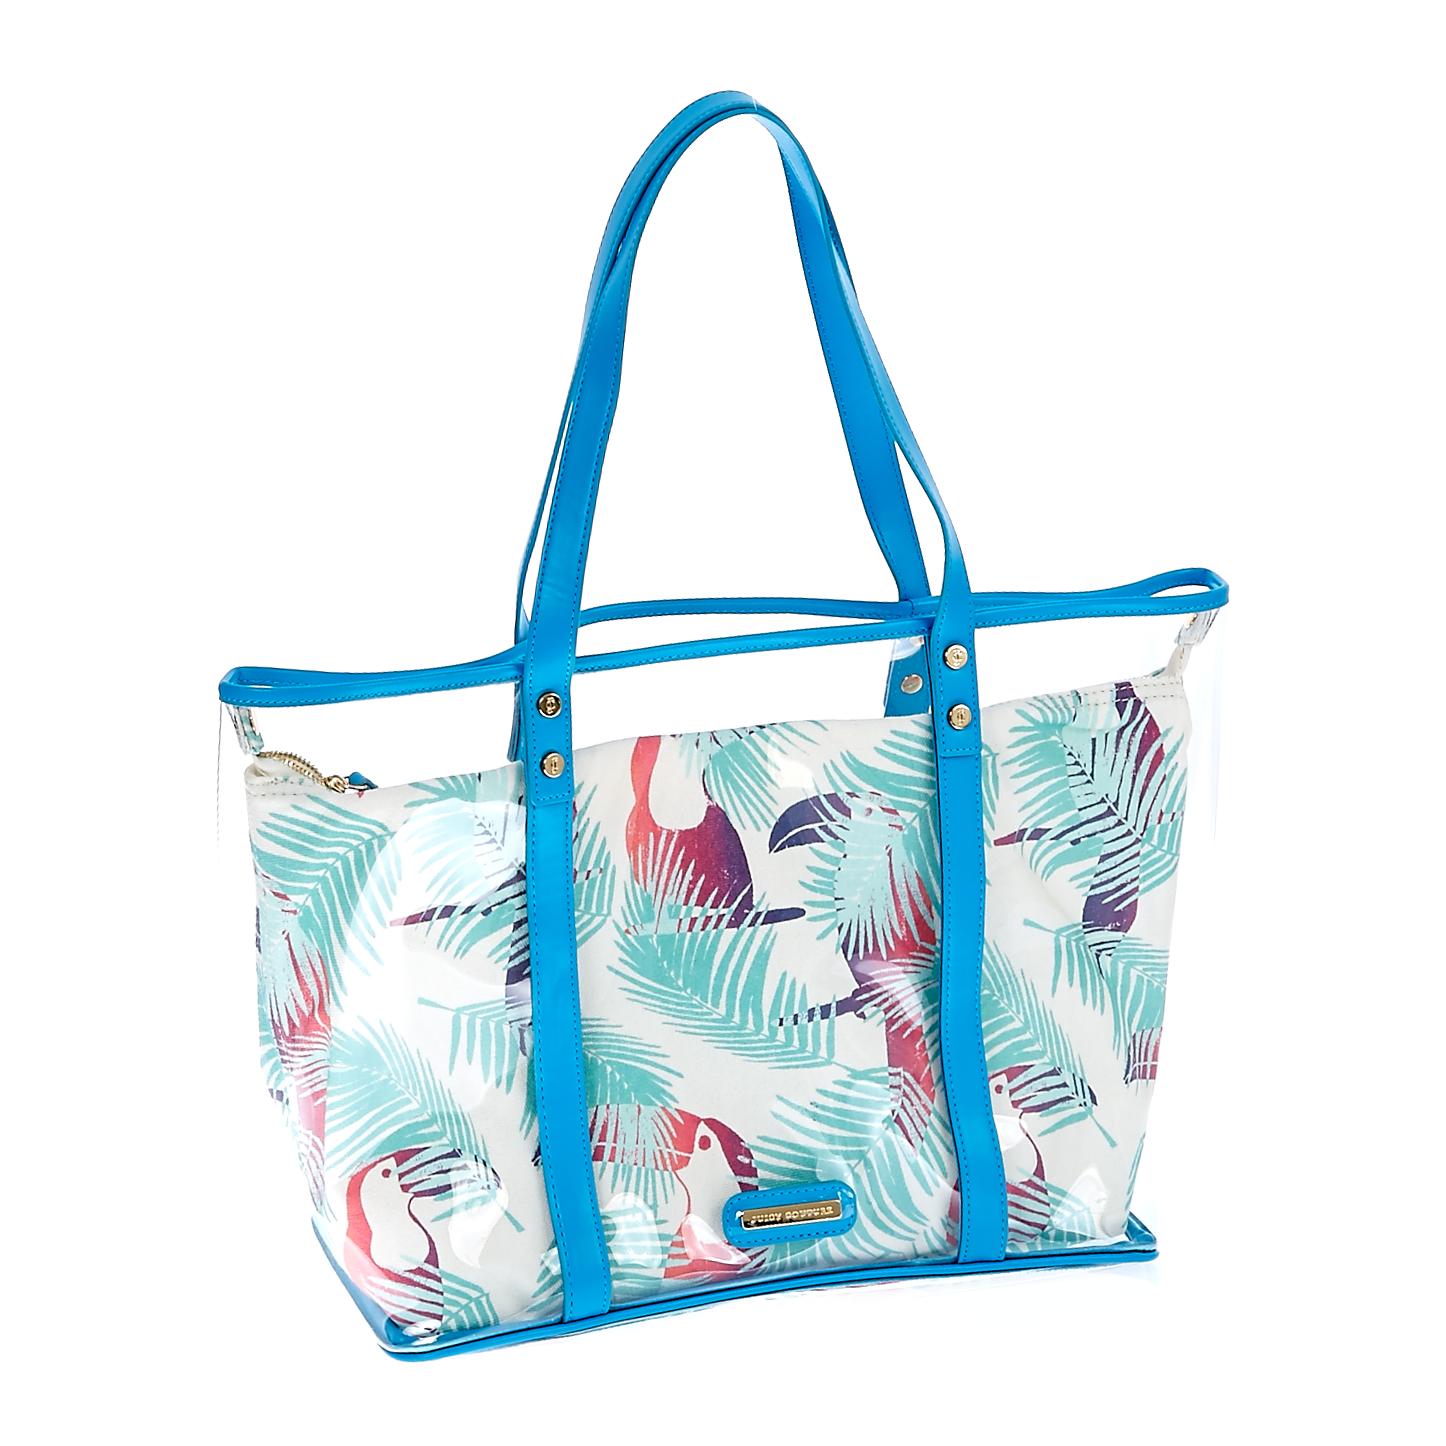 JUICY COUTURE – Γυναικεία τσάντα Juicy Couture μπλε-λευκή 1461028.0-0017